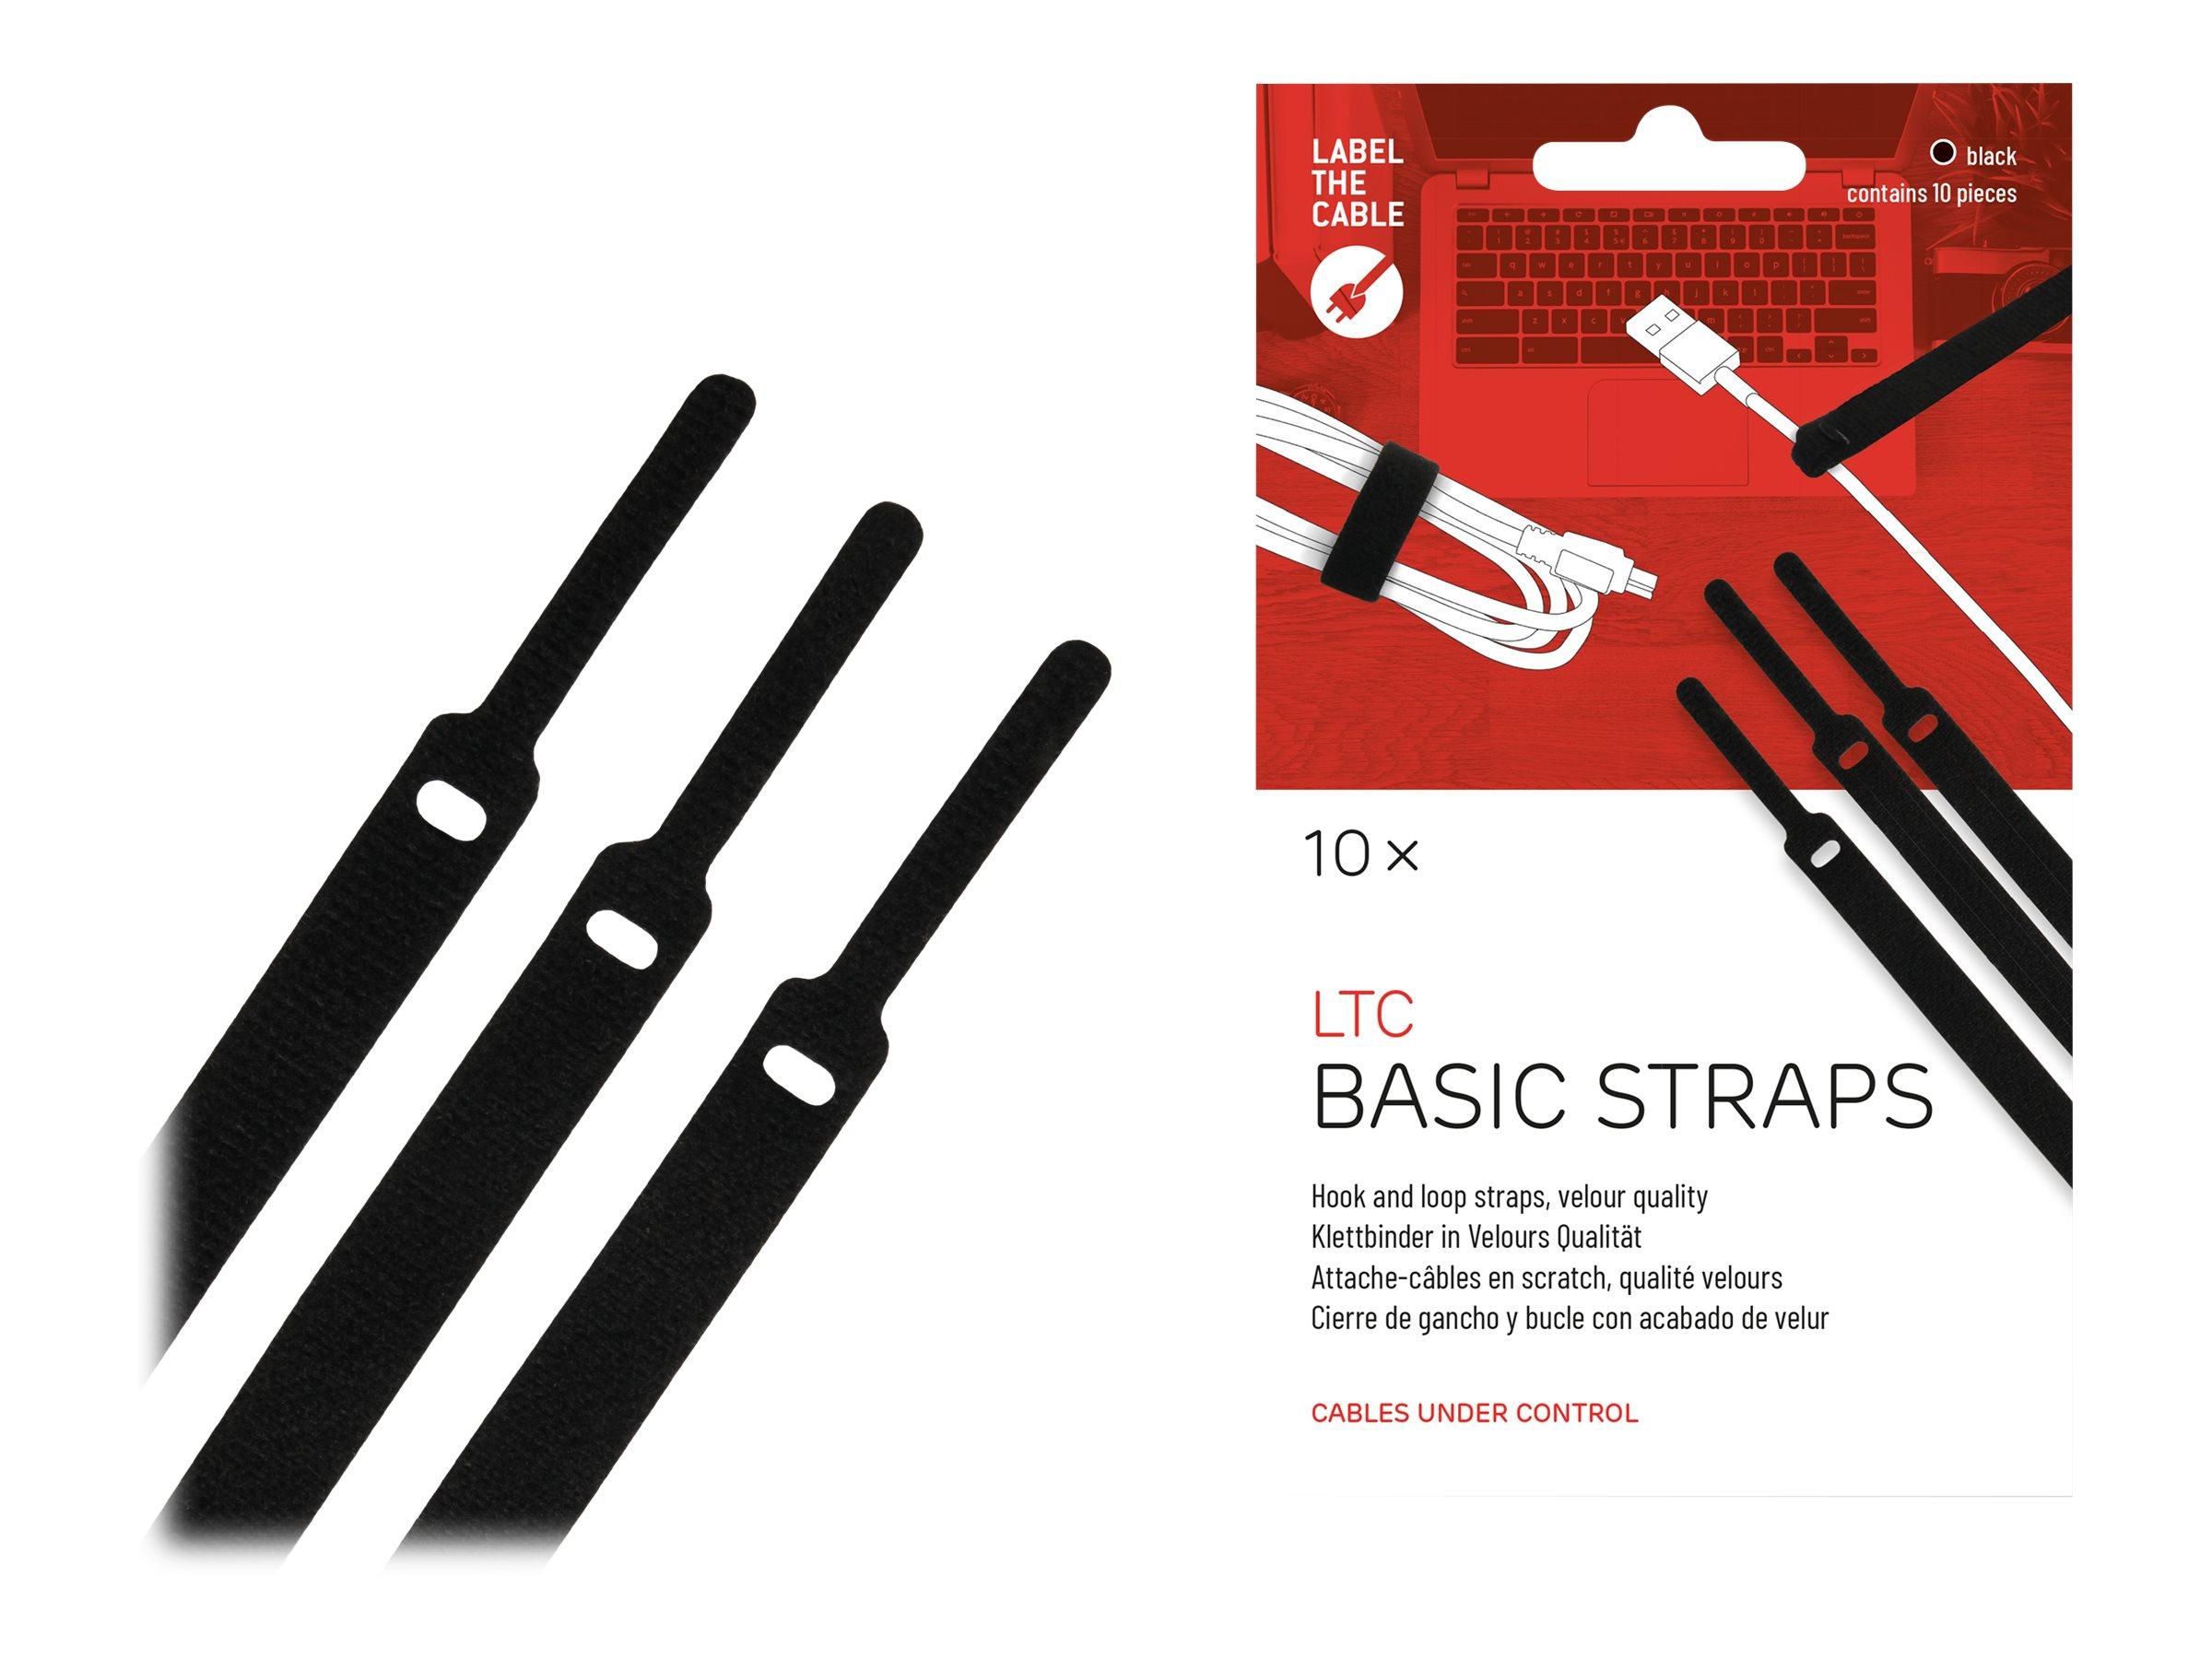 Label-the-cable LTC BASIC STRAPS - Kabelbinder - 17 cm - Schwarz (Packung mit 10)